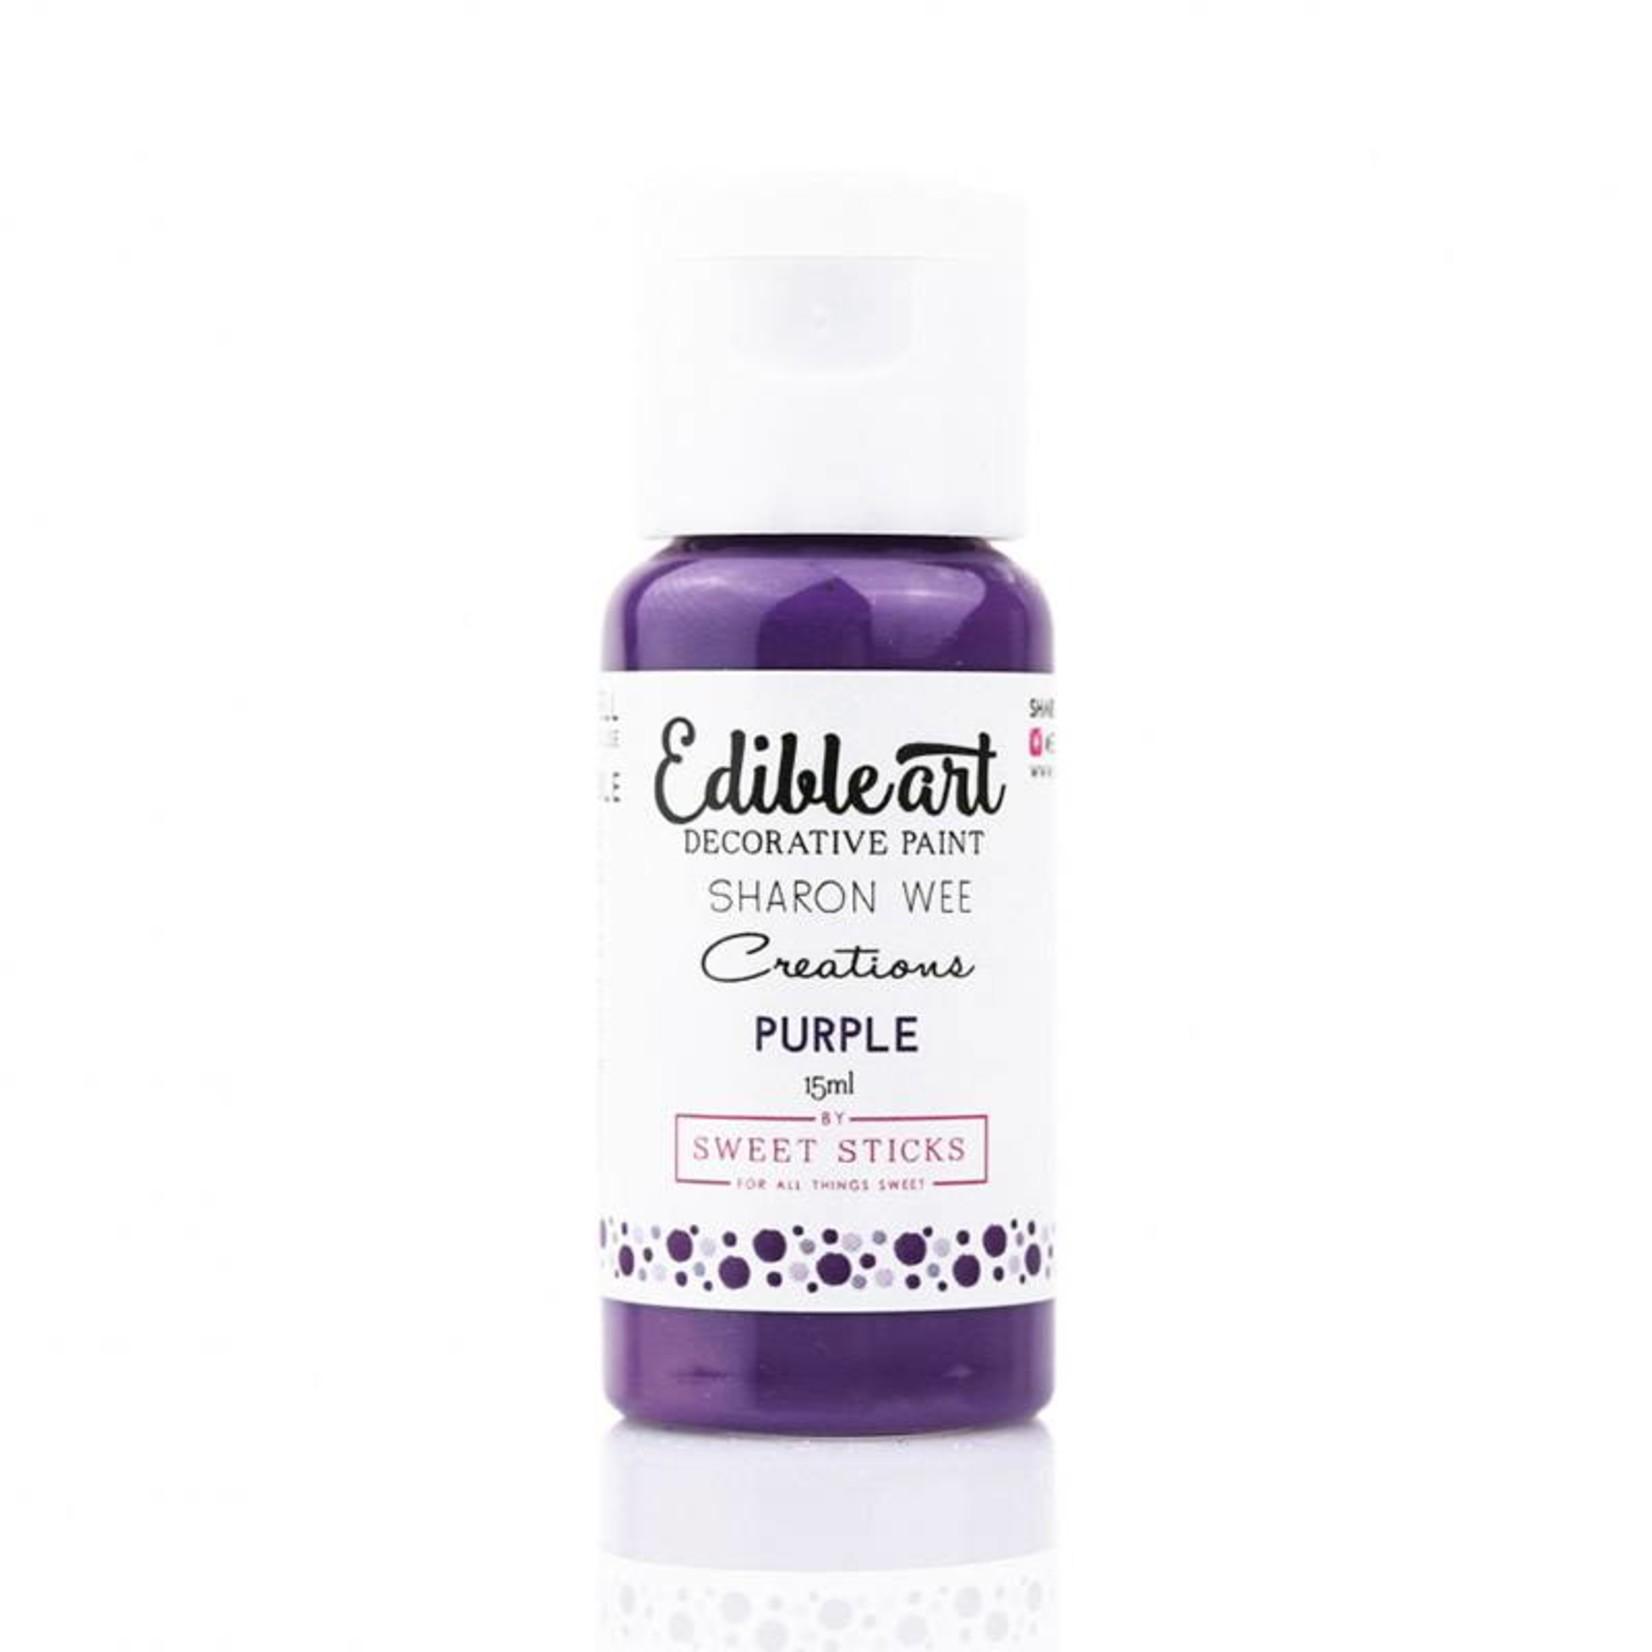 Sweet Sticks Sweet Sticks - Purple Edible Art Paint - 15mL